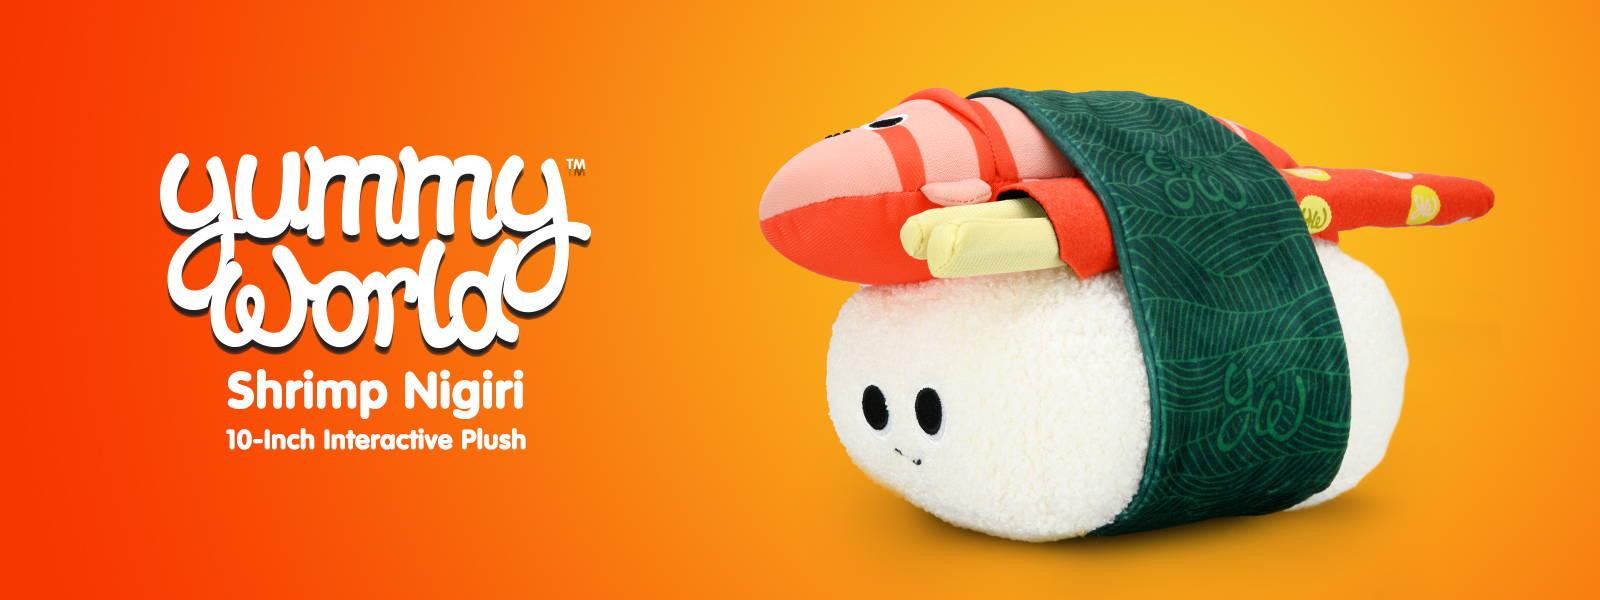 Yummy World Shrimp Nigiri Interactive Plush by Kidrobot